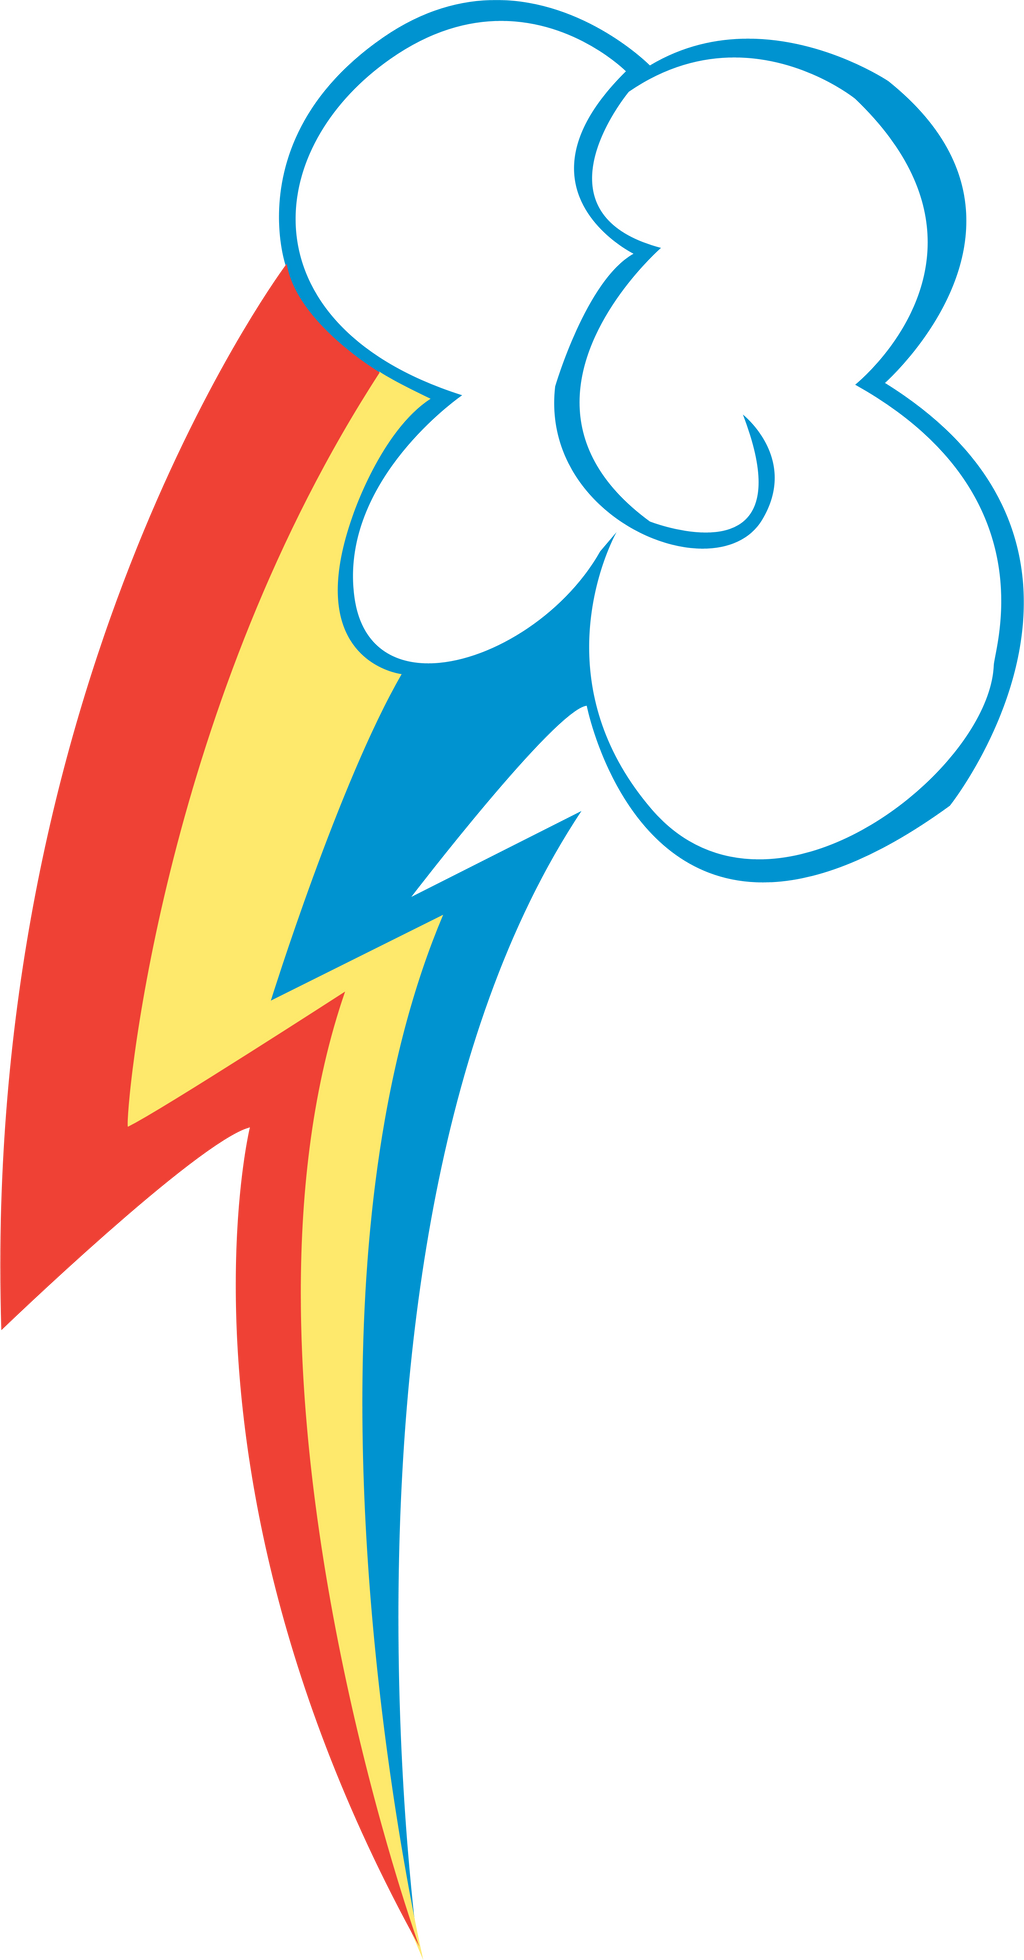 RainbowDash (for MattDash) | Publish with Glogster!